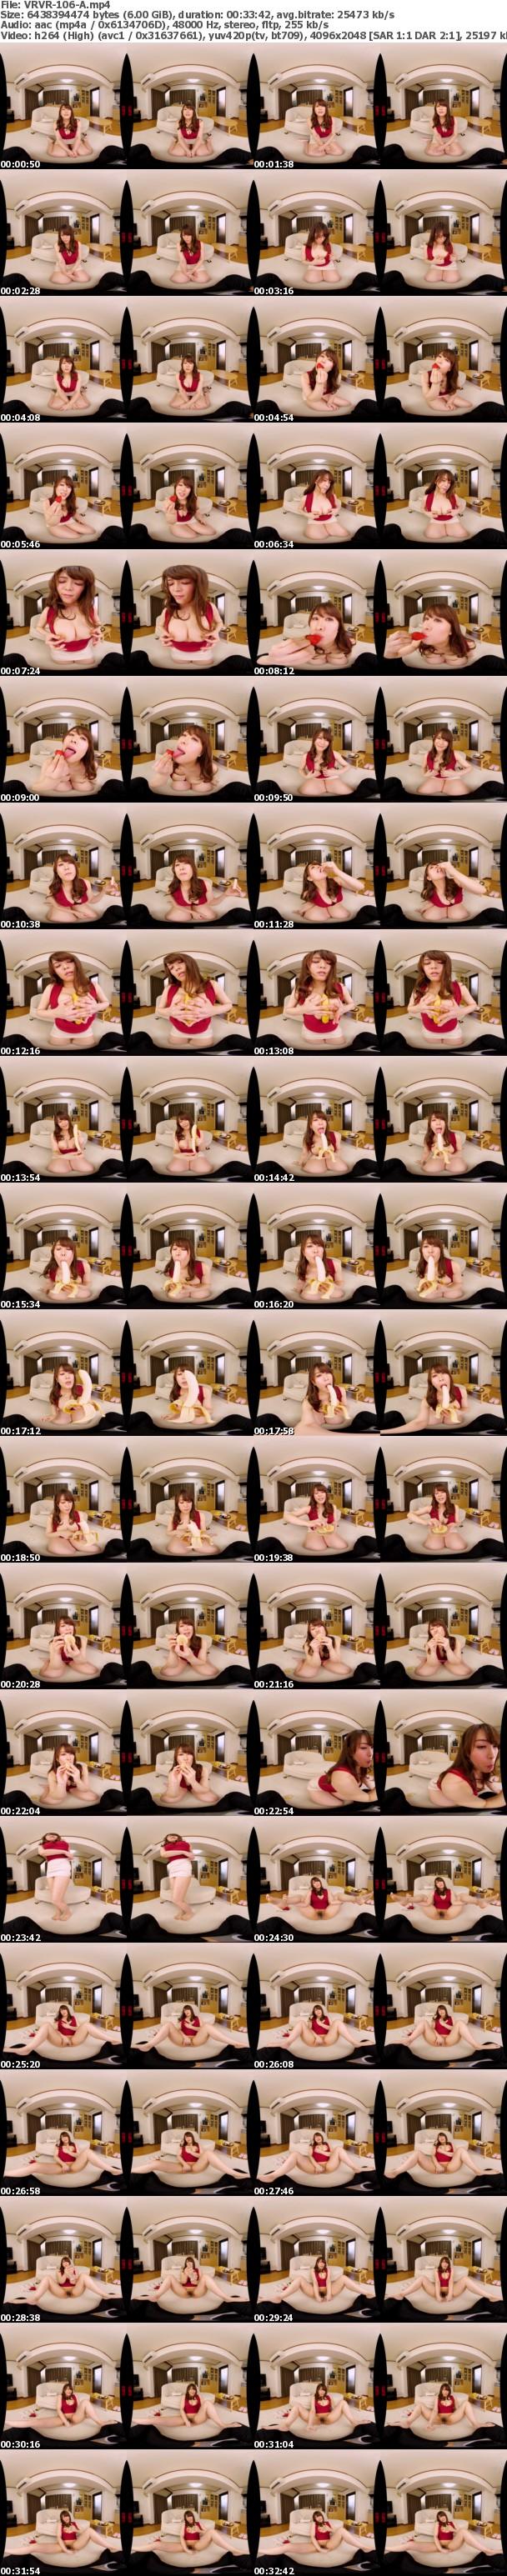 (VR) VRVR-106 HQ超高画質!卑猥な淫語と音で聴覚刺激しながらデカ乳母が性教育!広瀬結香